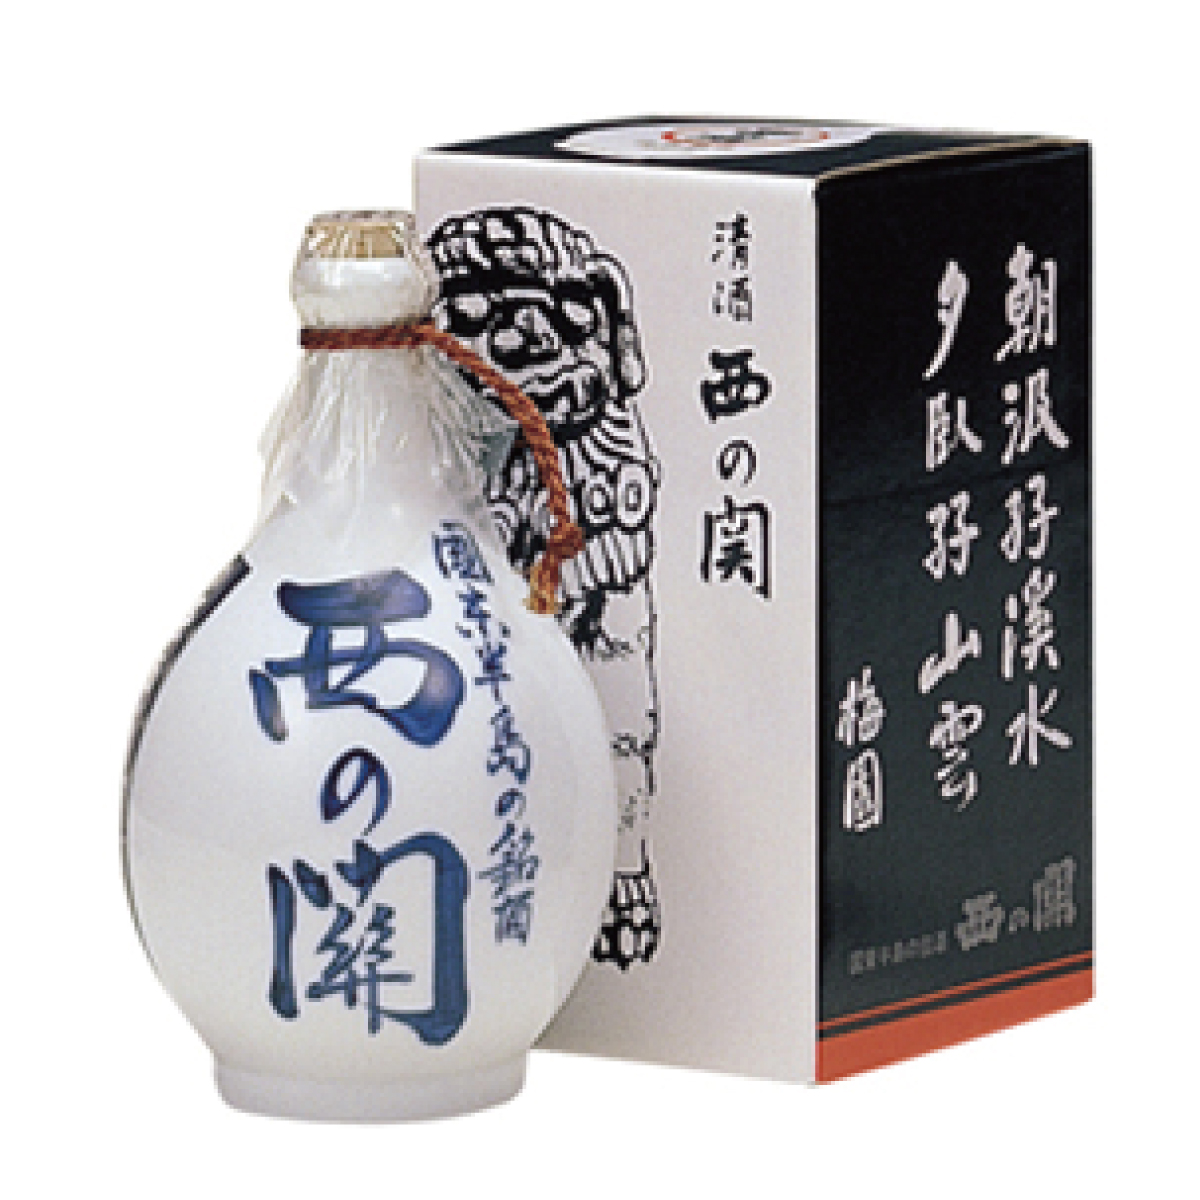 西の関 田舎徳利 900ml 手造り本醸造原酒